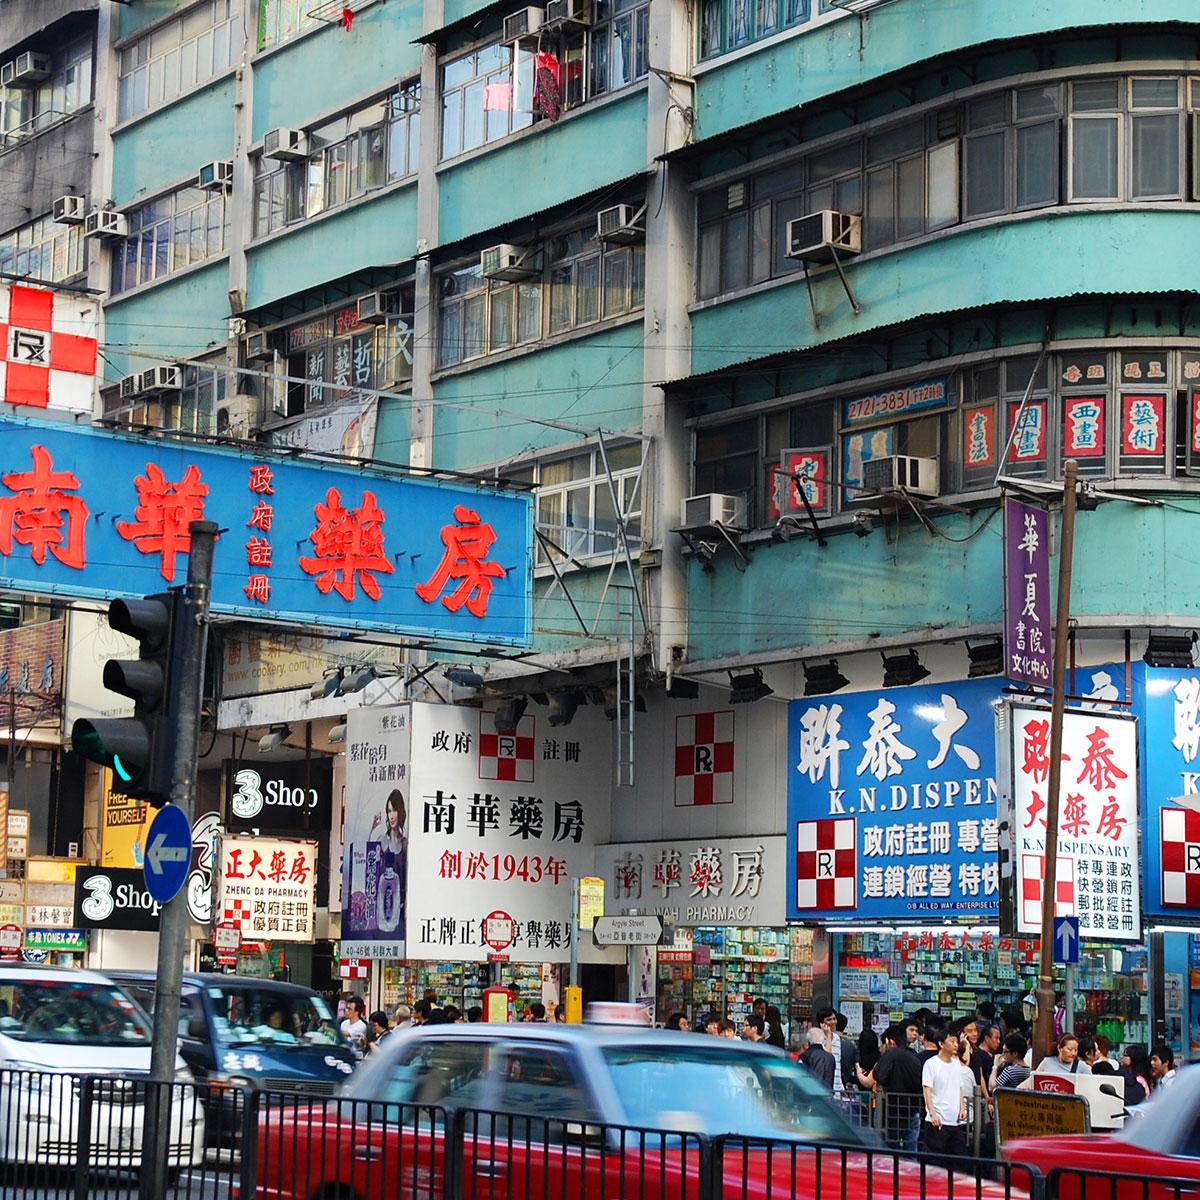 De äldre kvarteren i Kowloon.